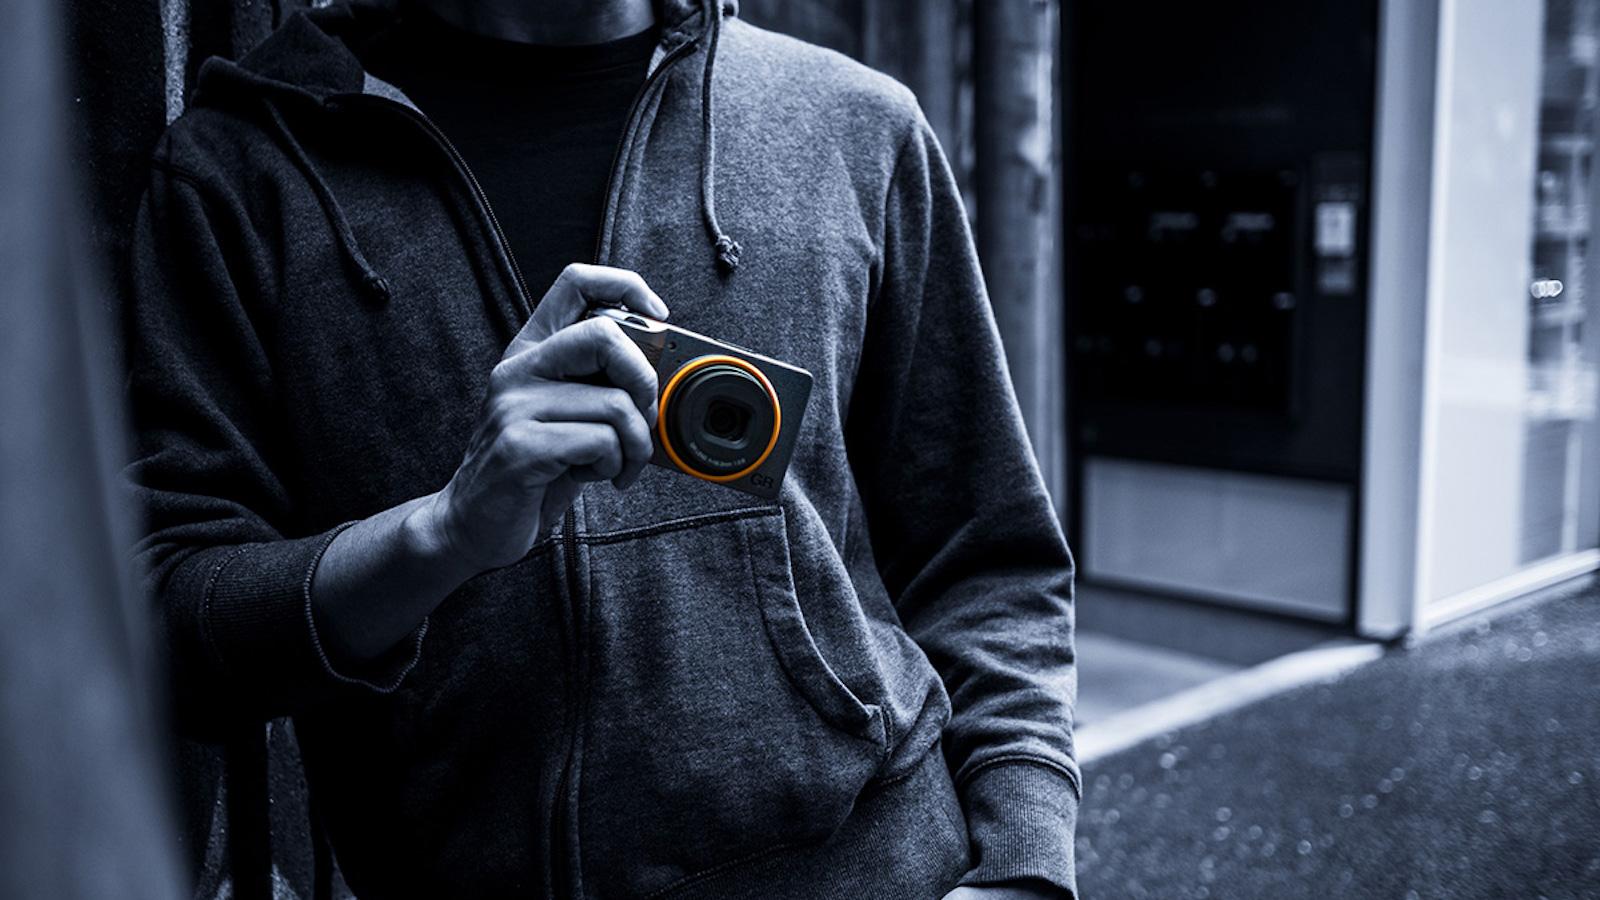 Ricoh GR III Street Edition Street Camera